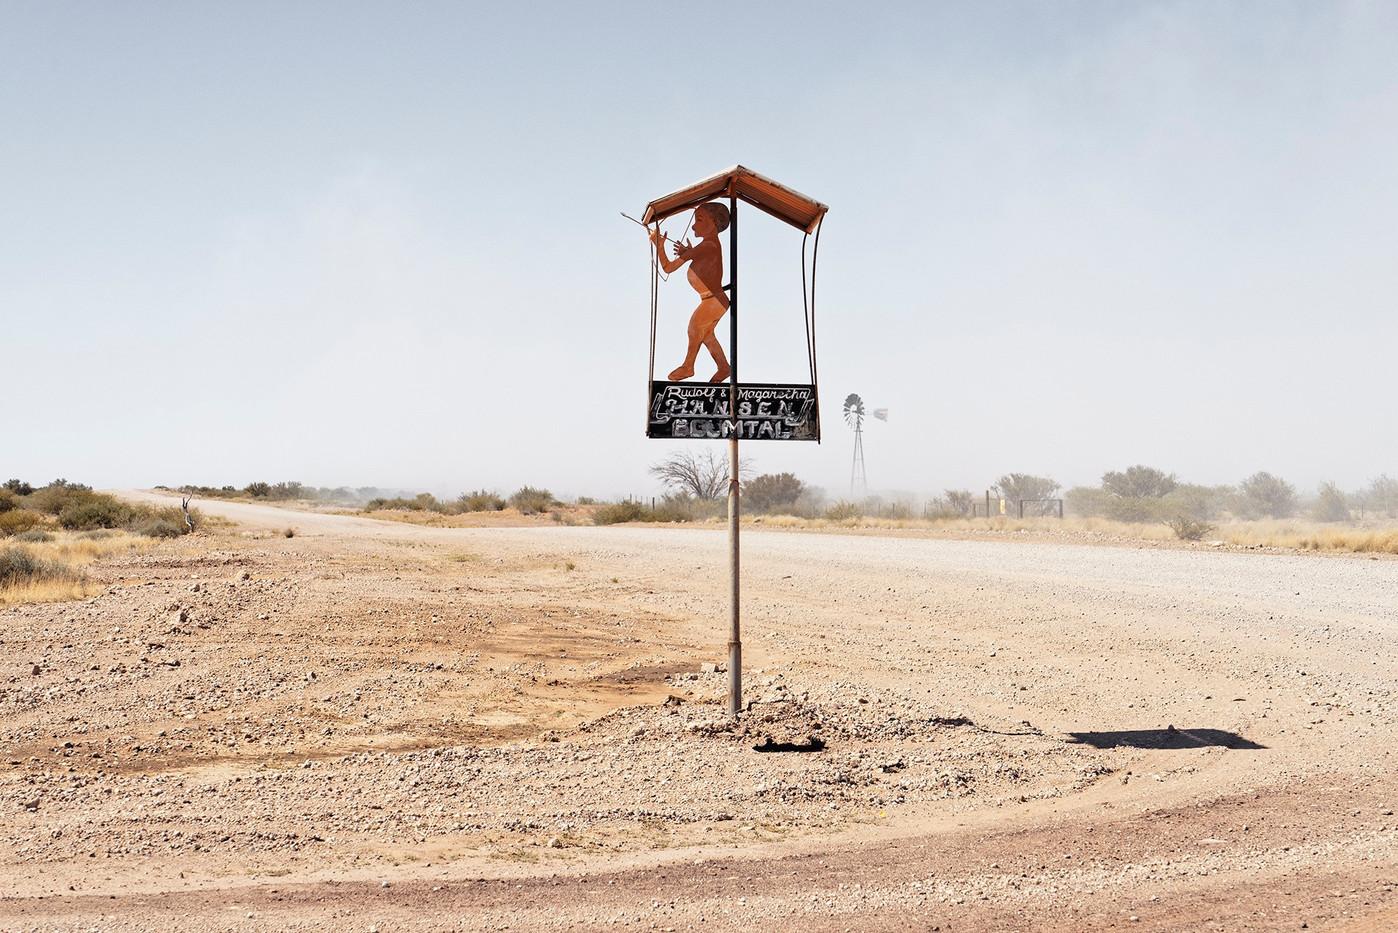 Margaret Courney-Clarke | Boumtal farm entrance,Witpan, D614 Kalahari, Namibia | Giclée Print on Photo Rag Baryta Paper | 50 x 75 cm  | Edition of 6 + 2 AP